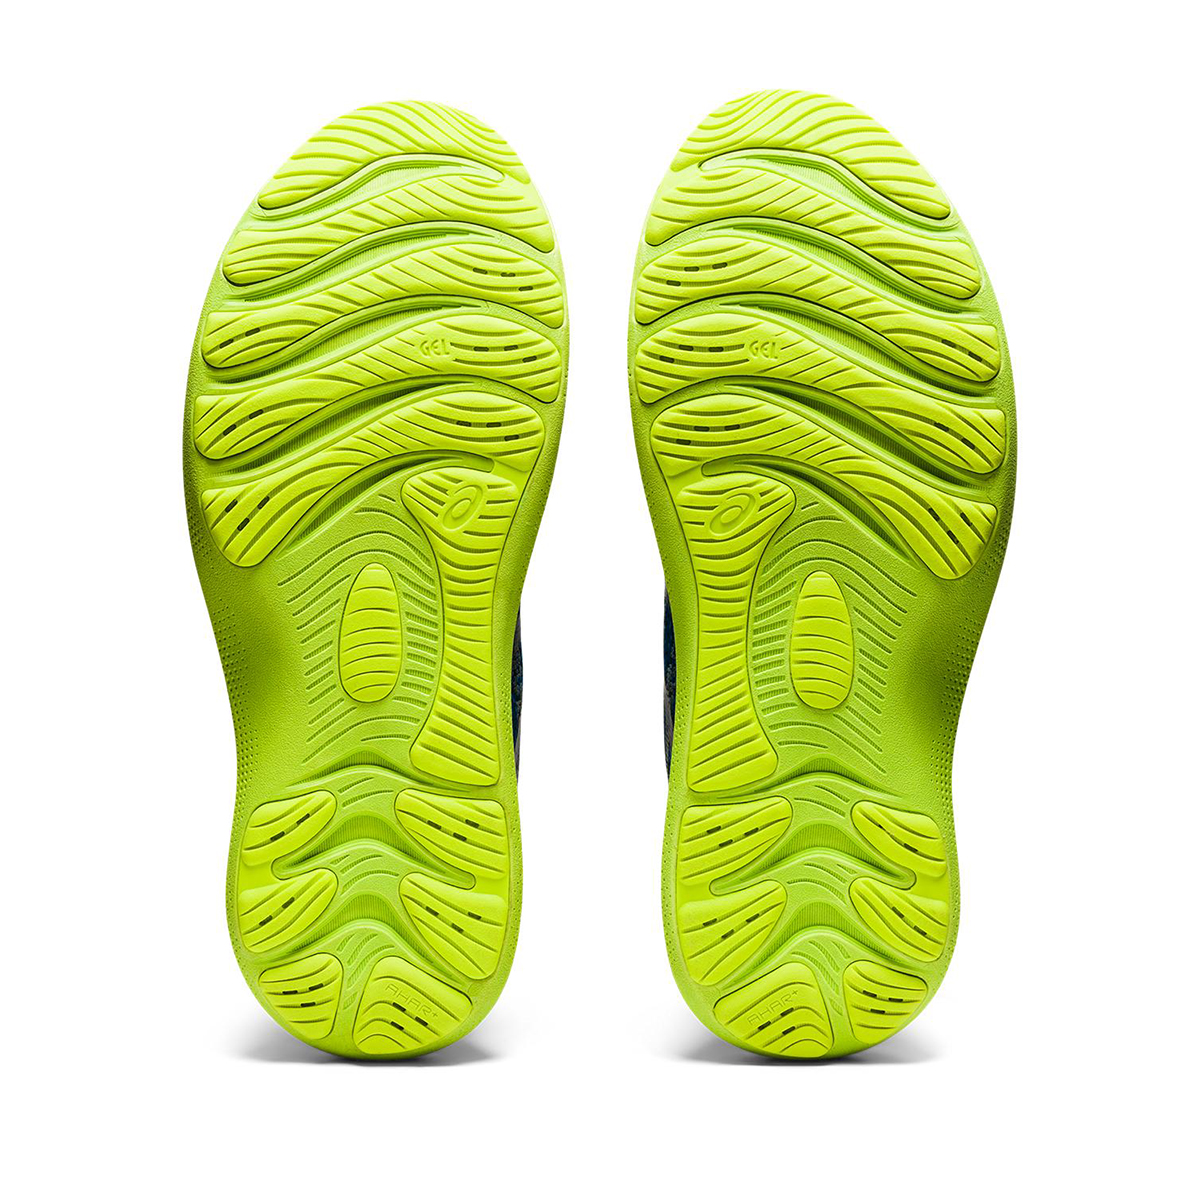 Men's Asics Gel-Nimbus Lite 2 Running Shoe - Color: Reborn Blue/Black - Size: 7 - Width: Regular, Reborn Blue/Black, large, image 6